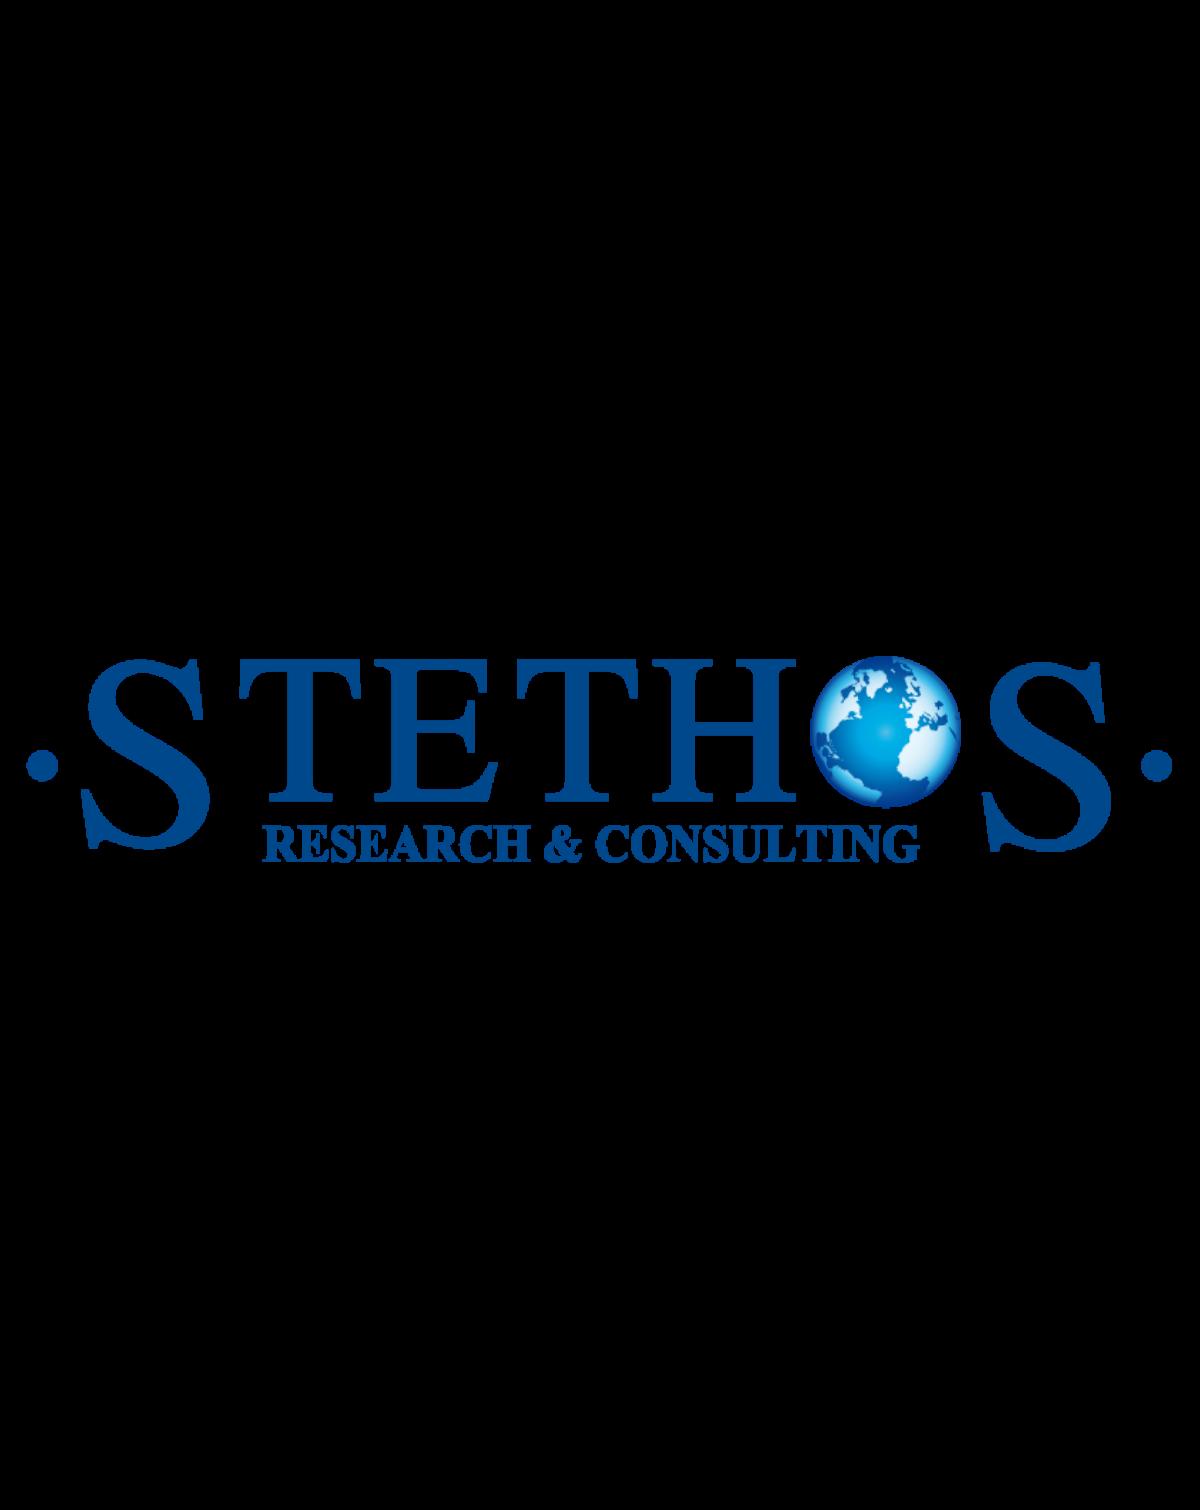 stethos quote